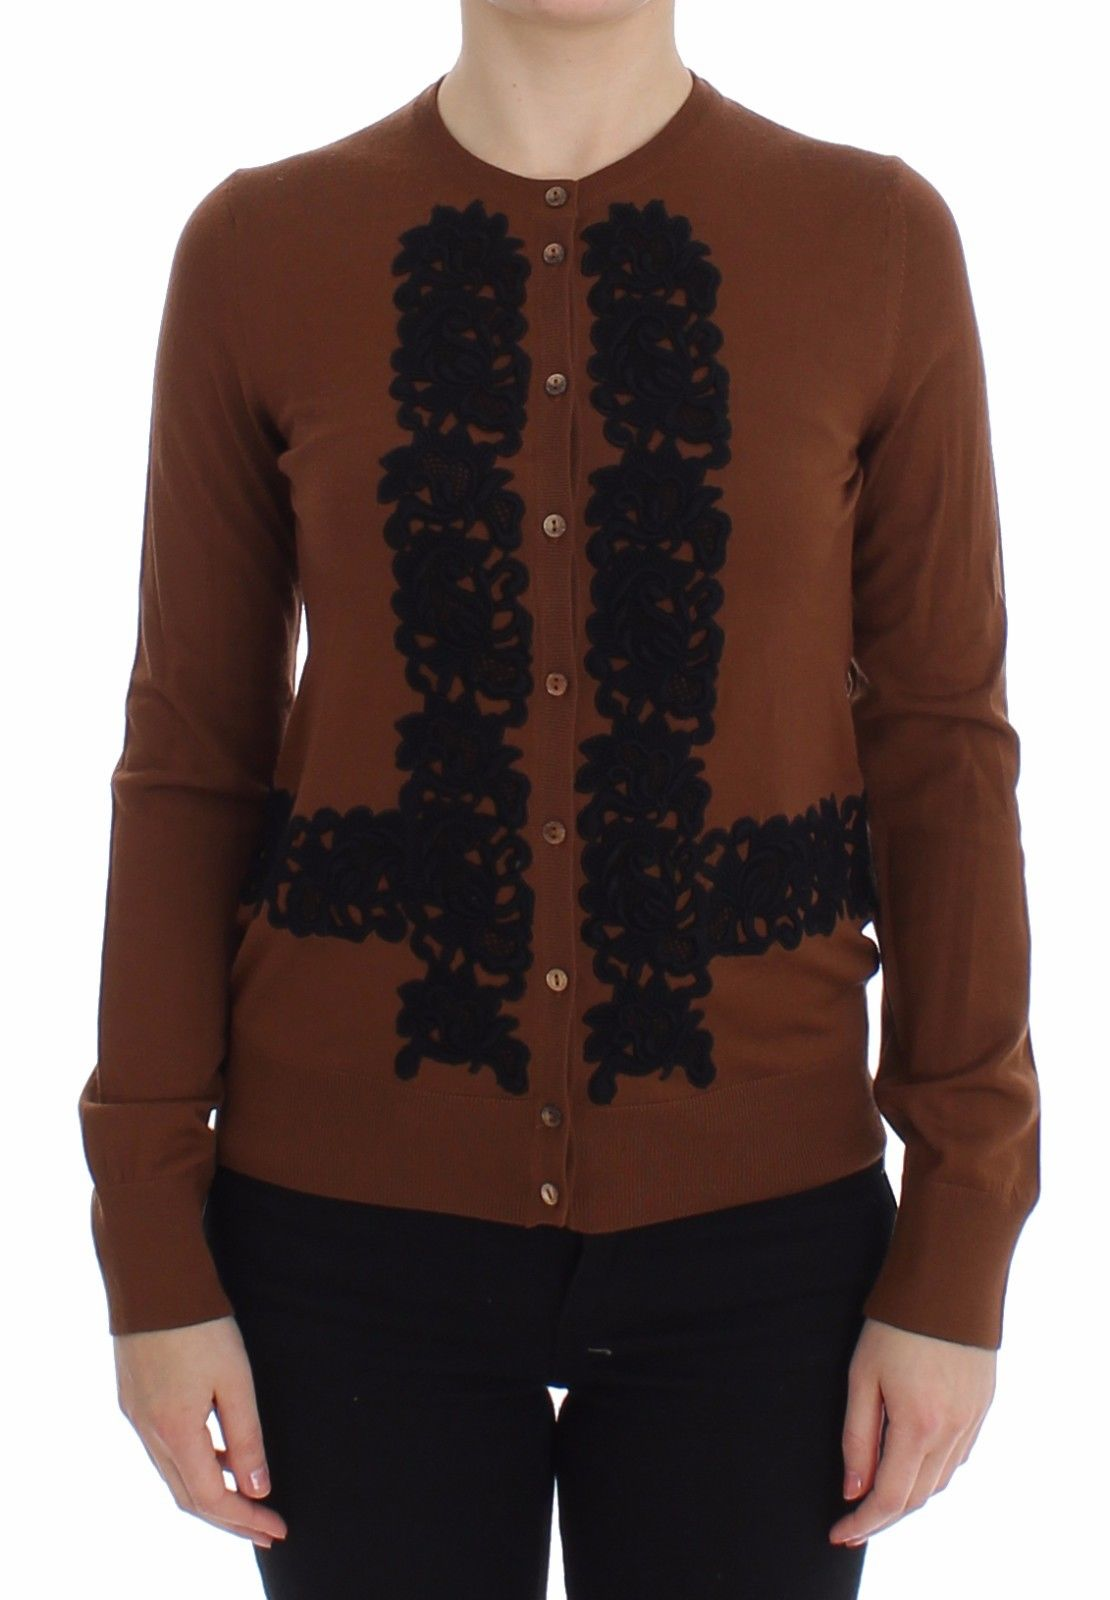 Dolce & Gabbana Women's Wool Lace Cardigan Brown SIG13277 - IT40|S